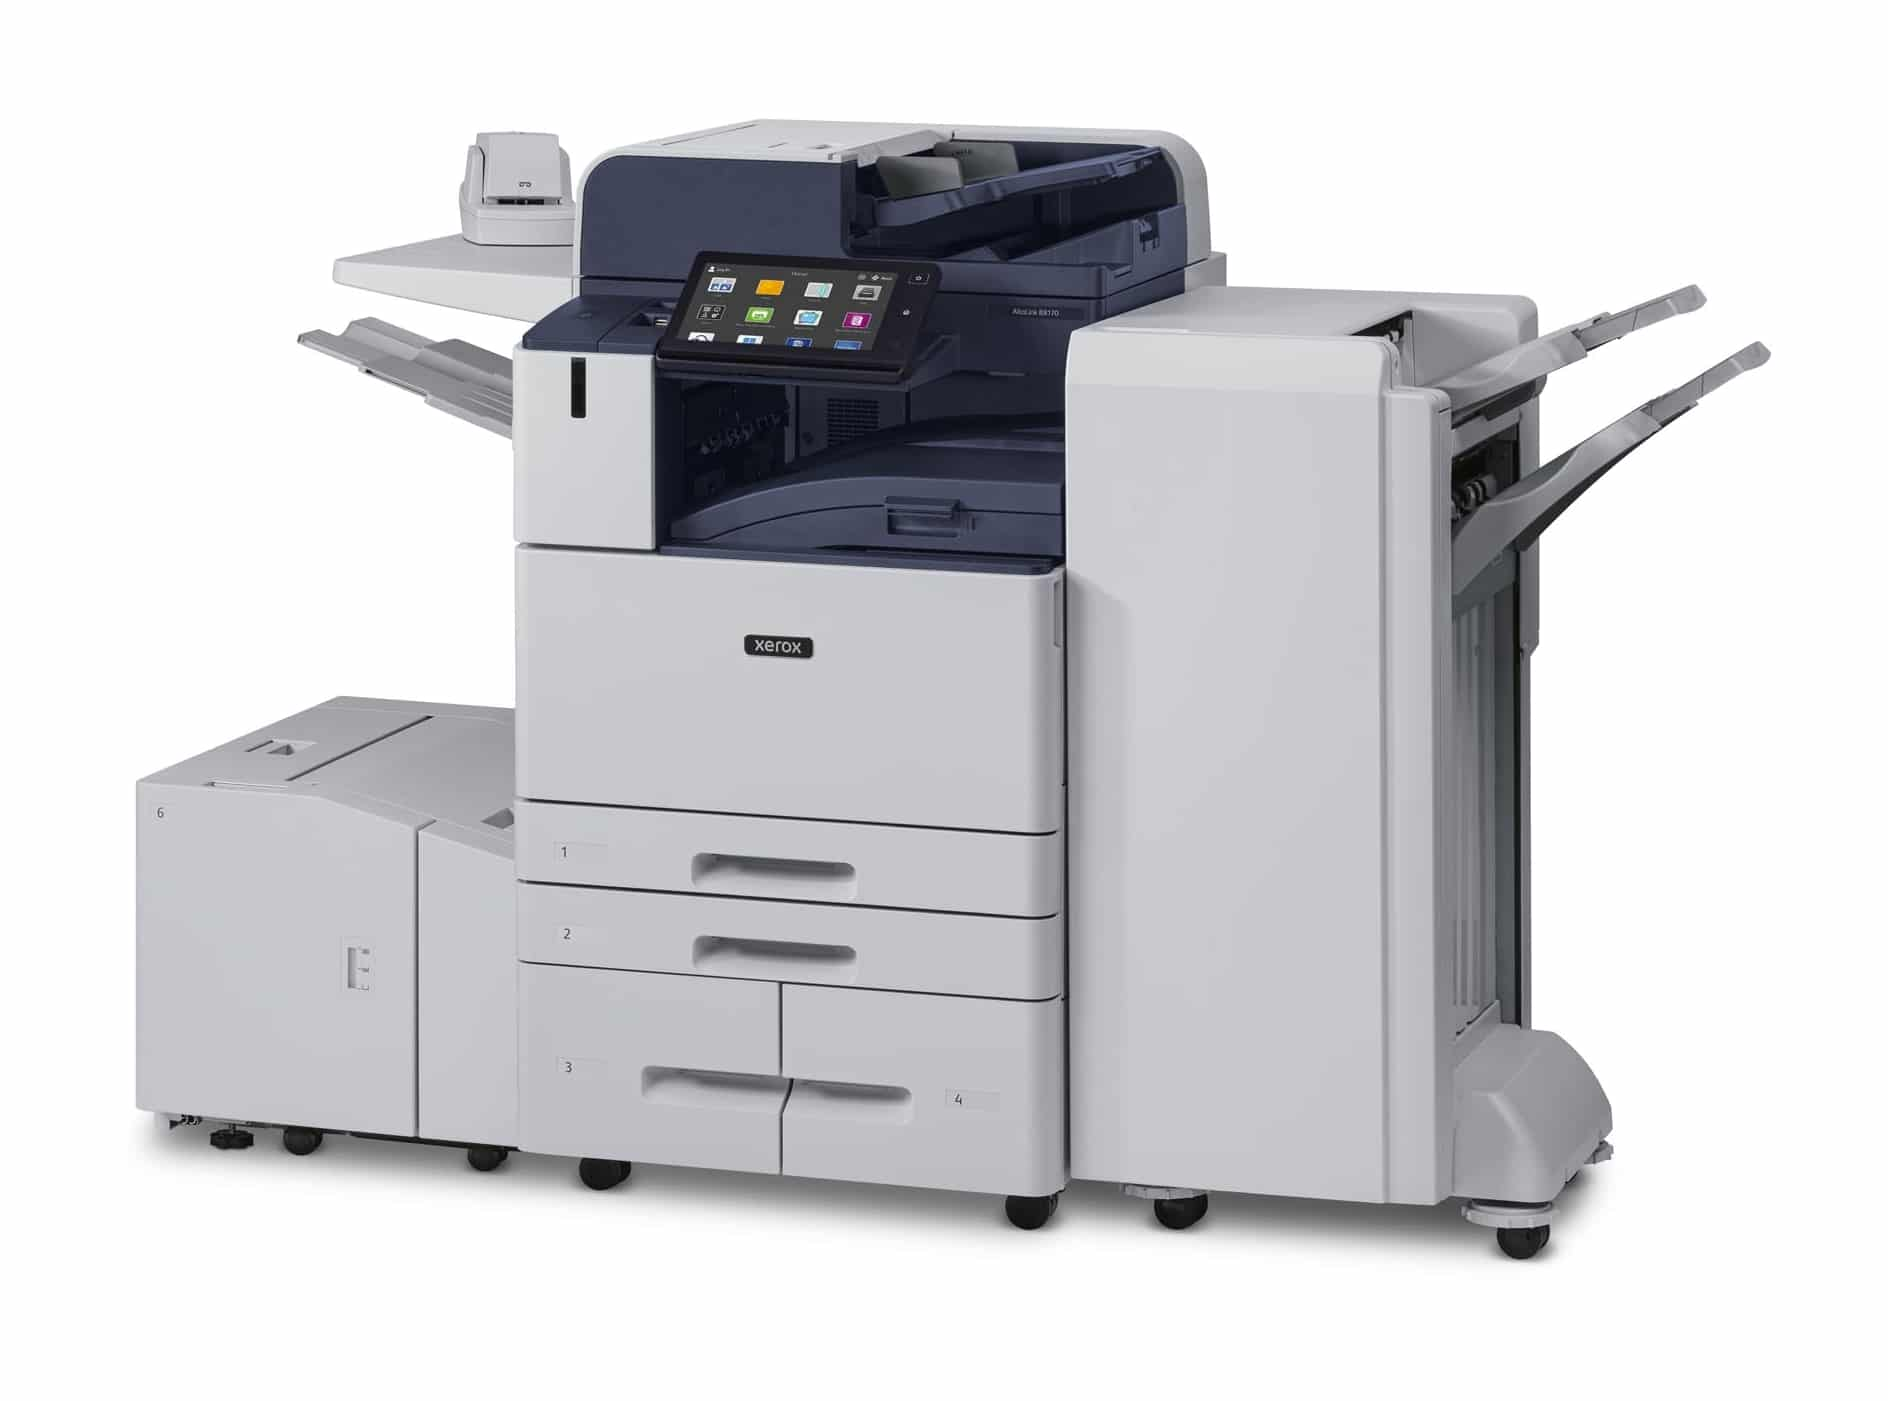 Impresora multifunción Xerox AltaLink B8145